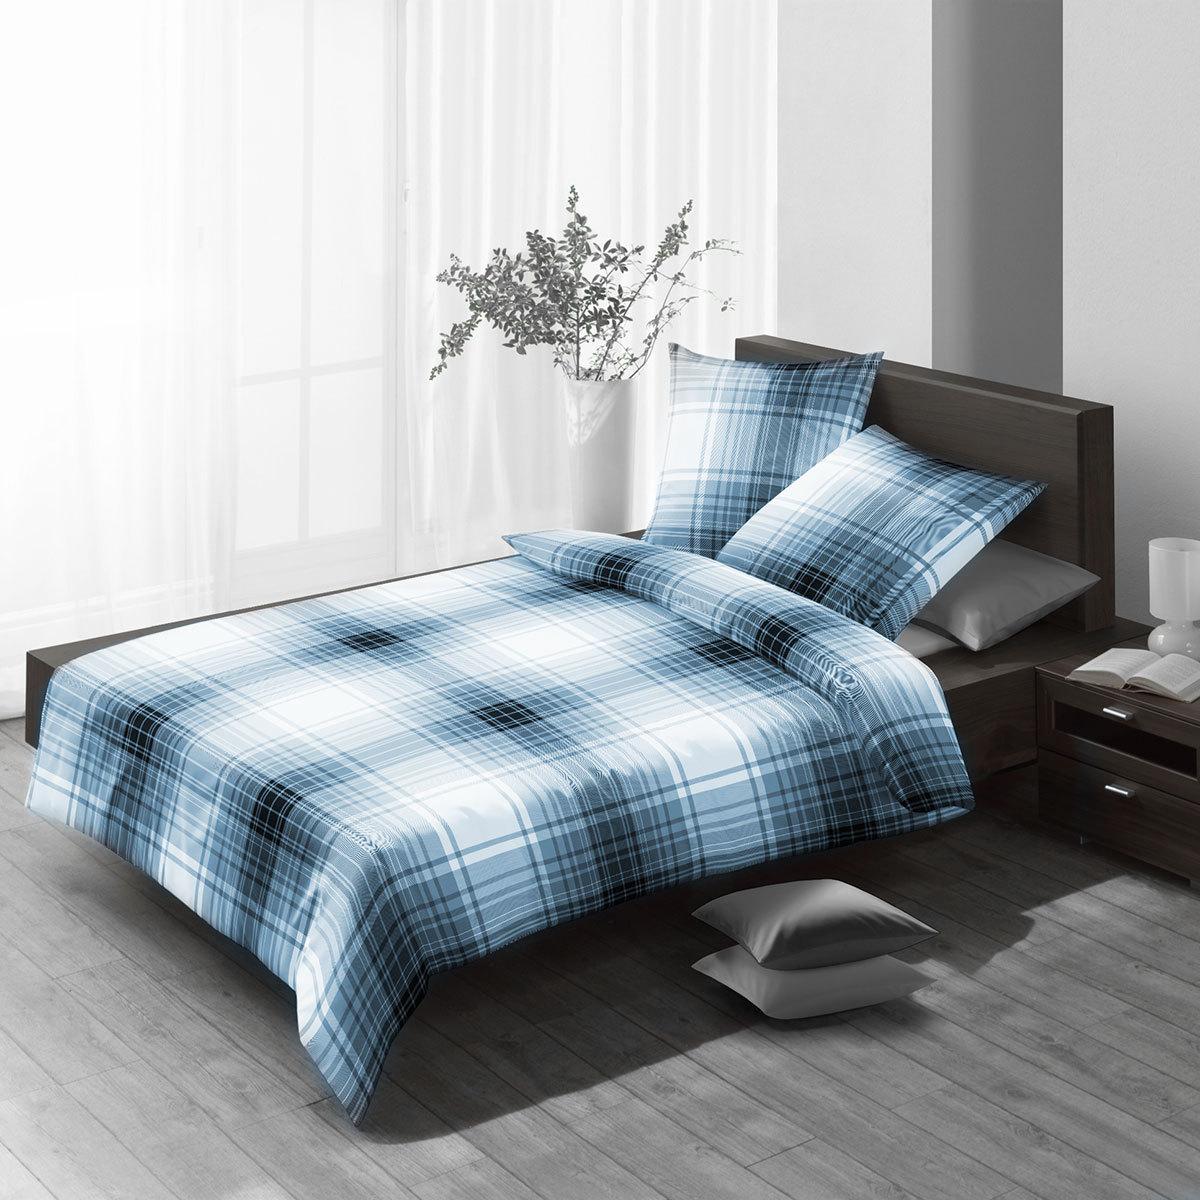 fleuresse edelflanell bettw sche 602949 12 indigo g nstig. Black Bedroom Furniture Sets. Home Design Ideas